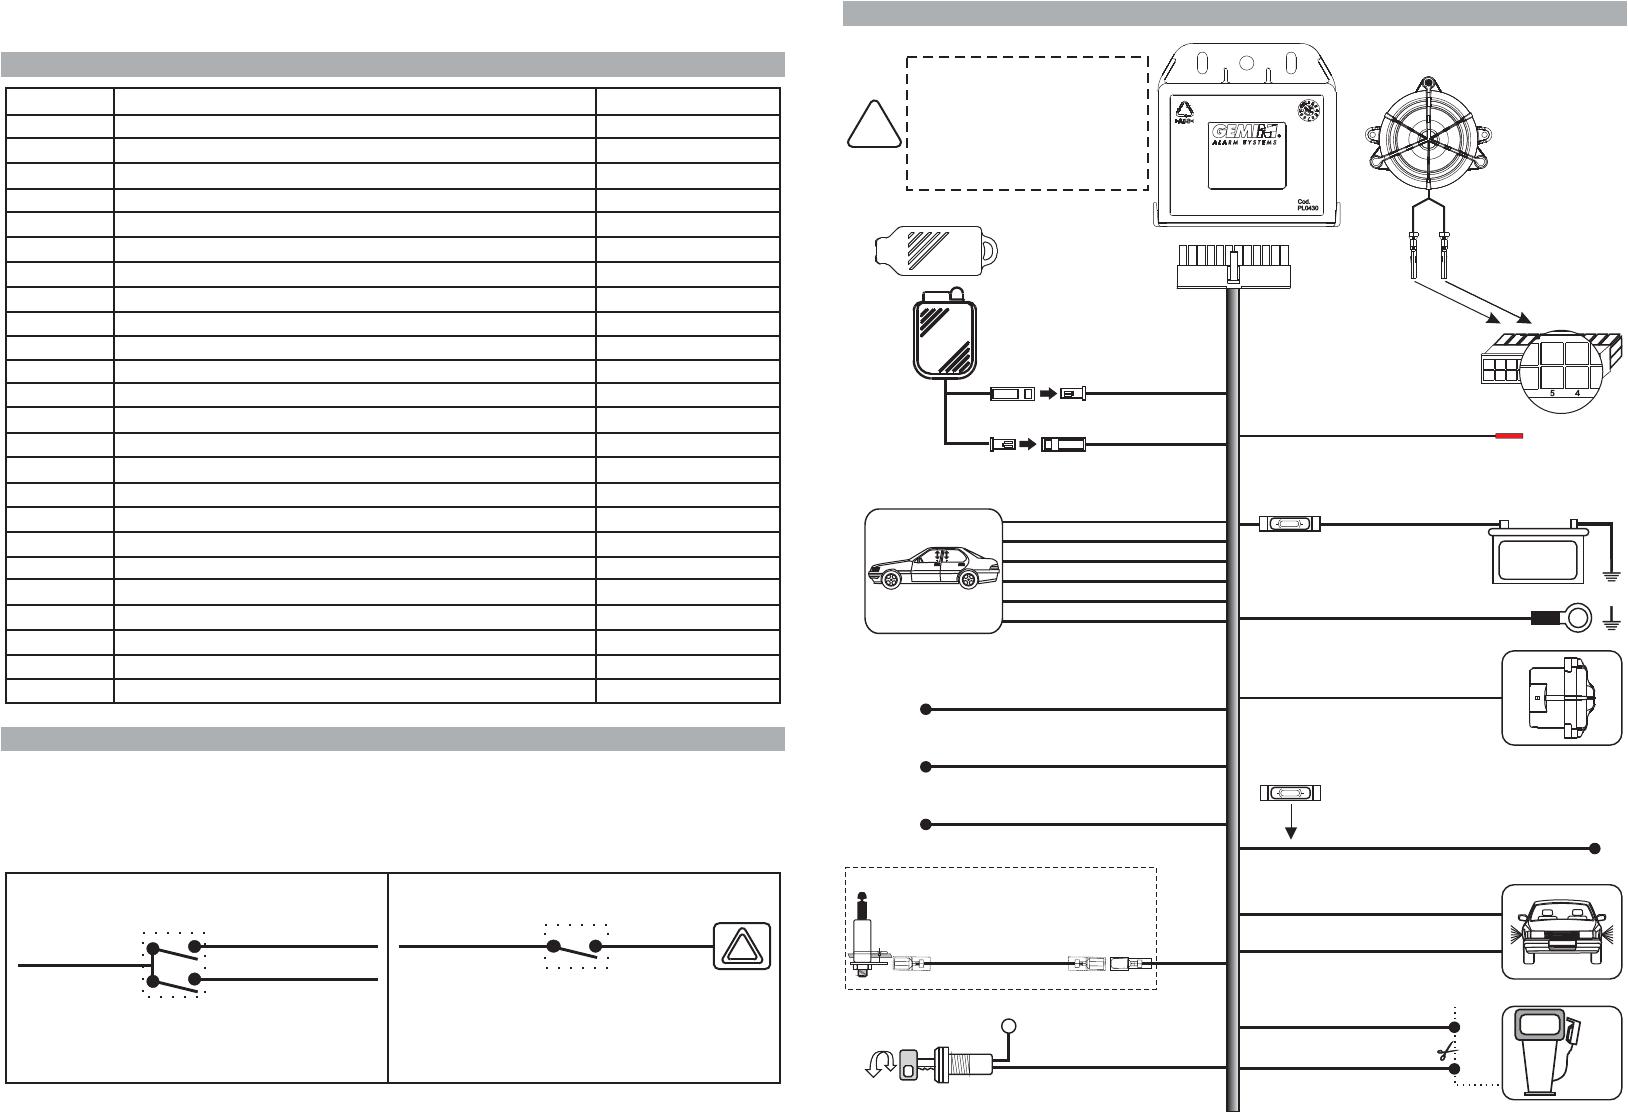 Manual Gemini 862 (page 1 of 8) (English)   Gemini Car Alarm Wiring Diagram      Libble.eu